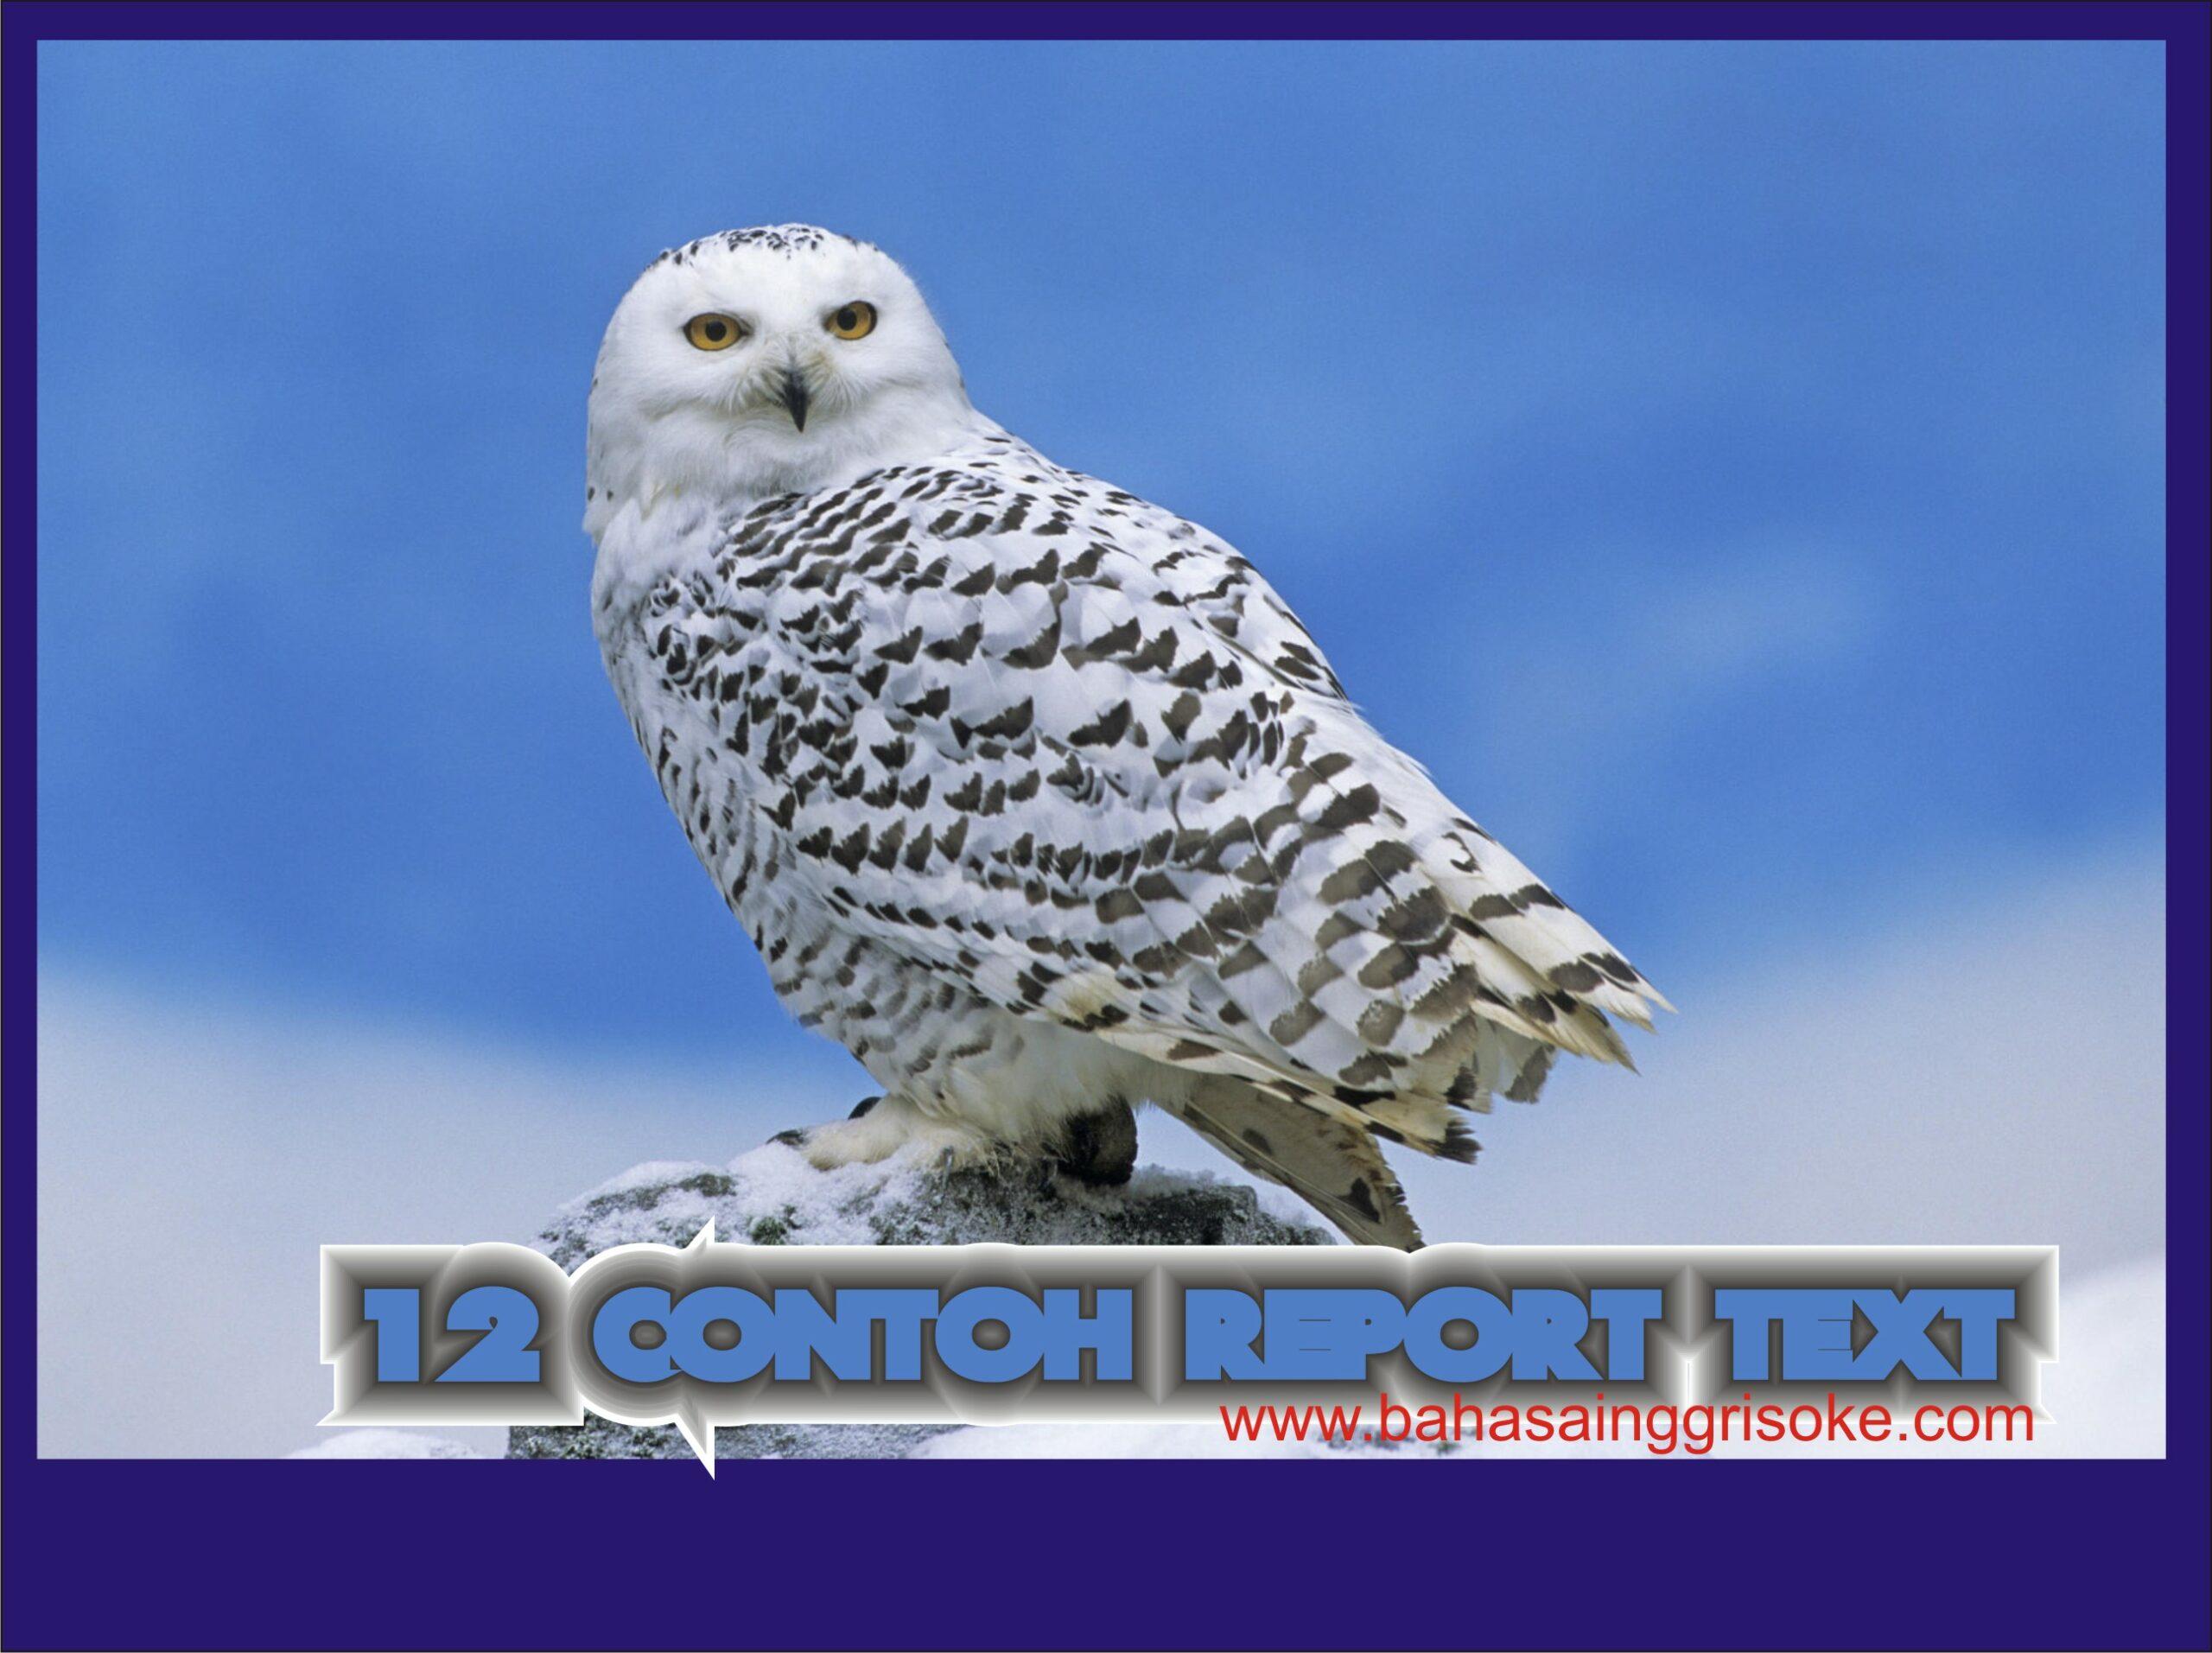 120 Contoh Report Text Bahasa Inggris Terbaru Beserta Artinya Bukuinggris Co Id